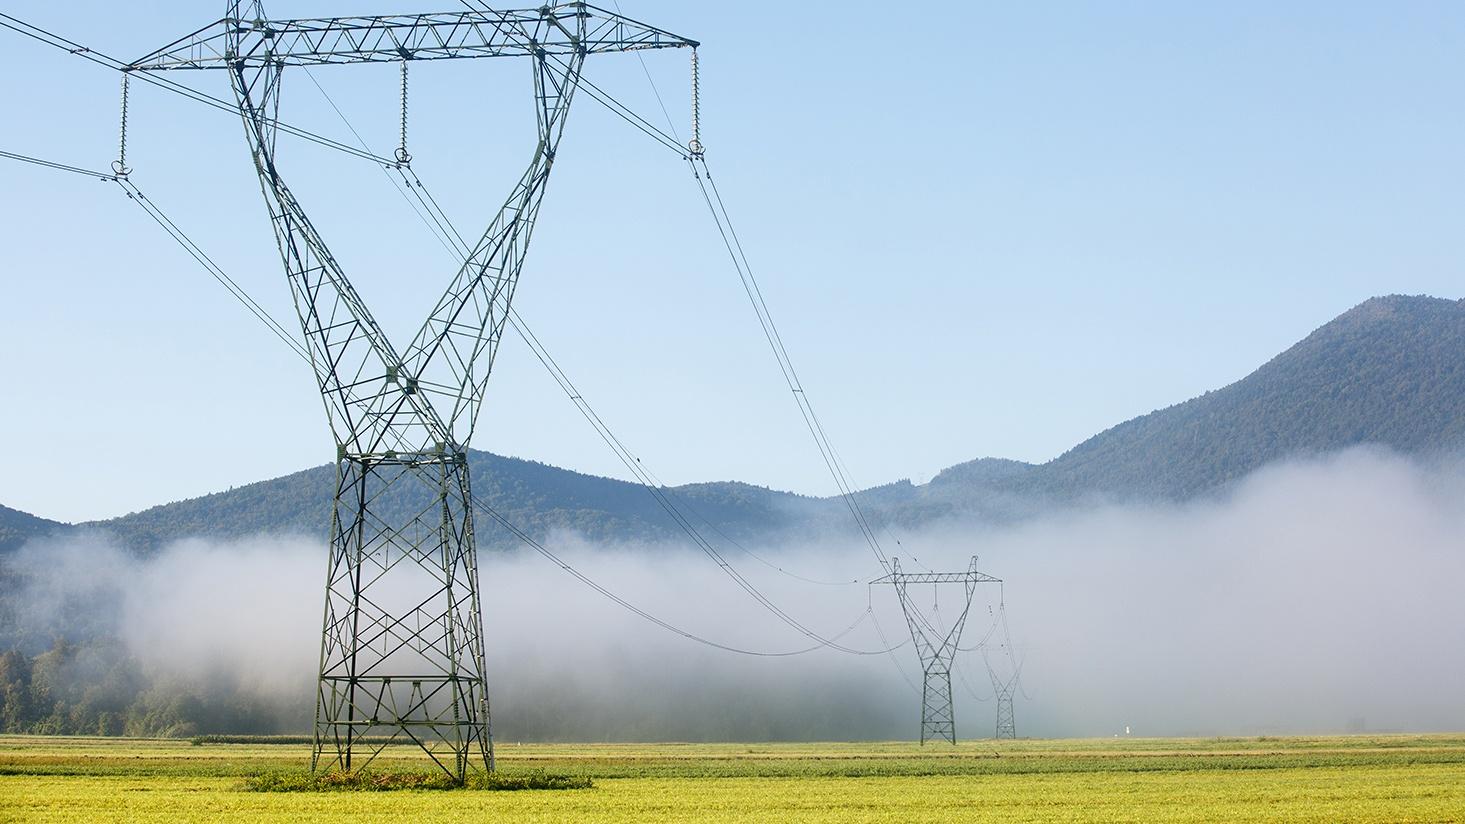 bigstock-Big-Electricity-High-Voltage-P-103791281.jpg